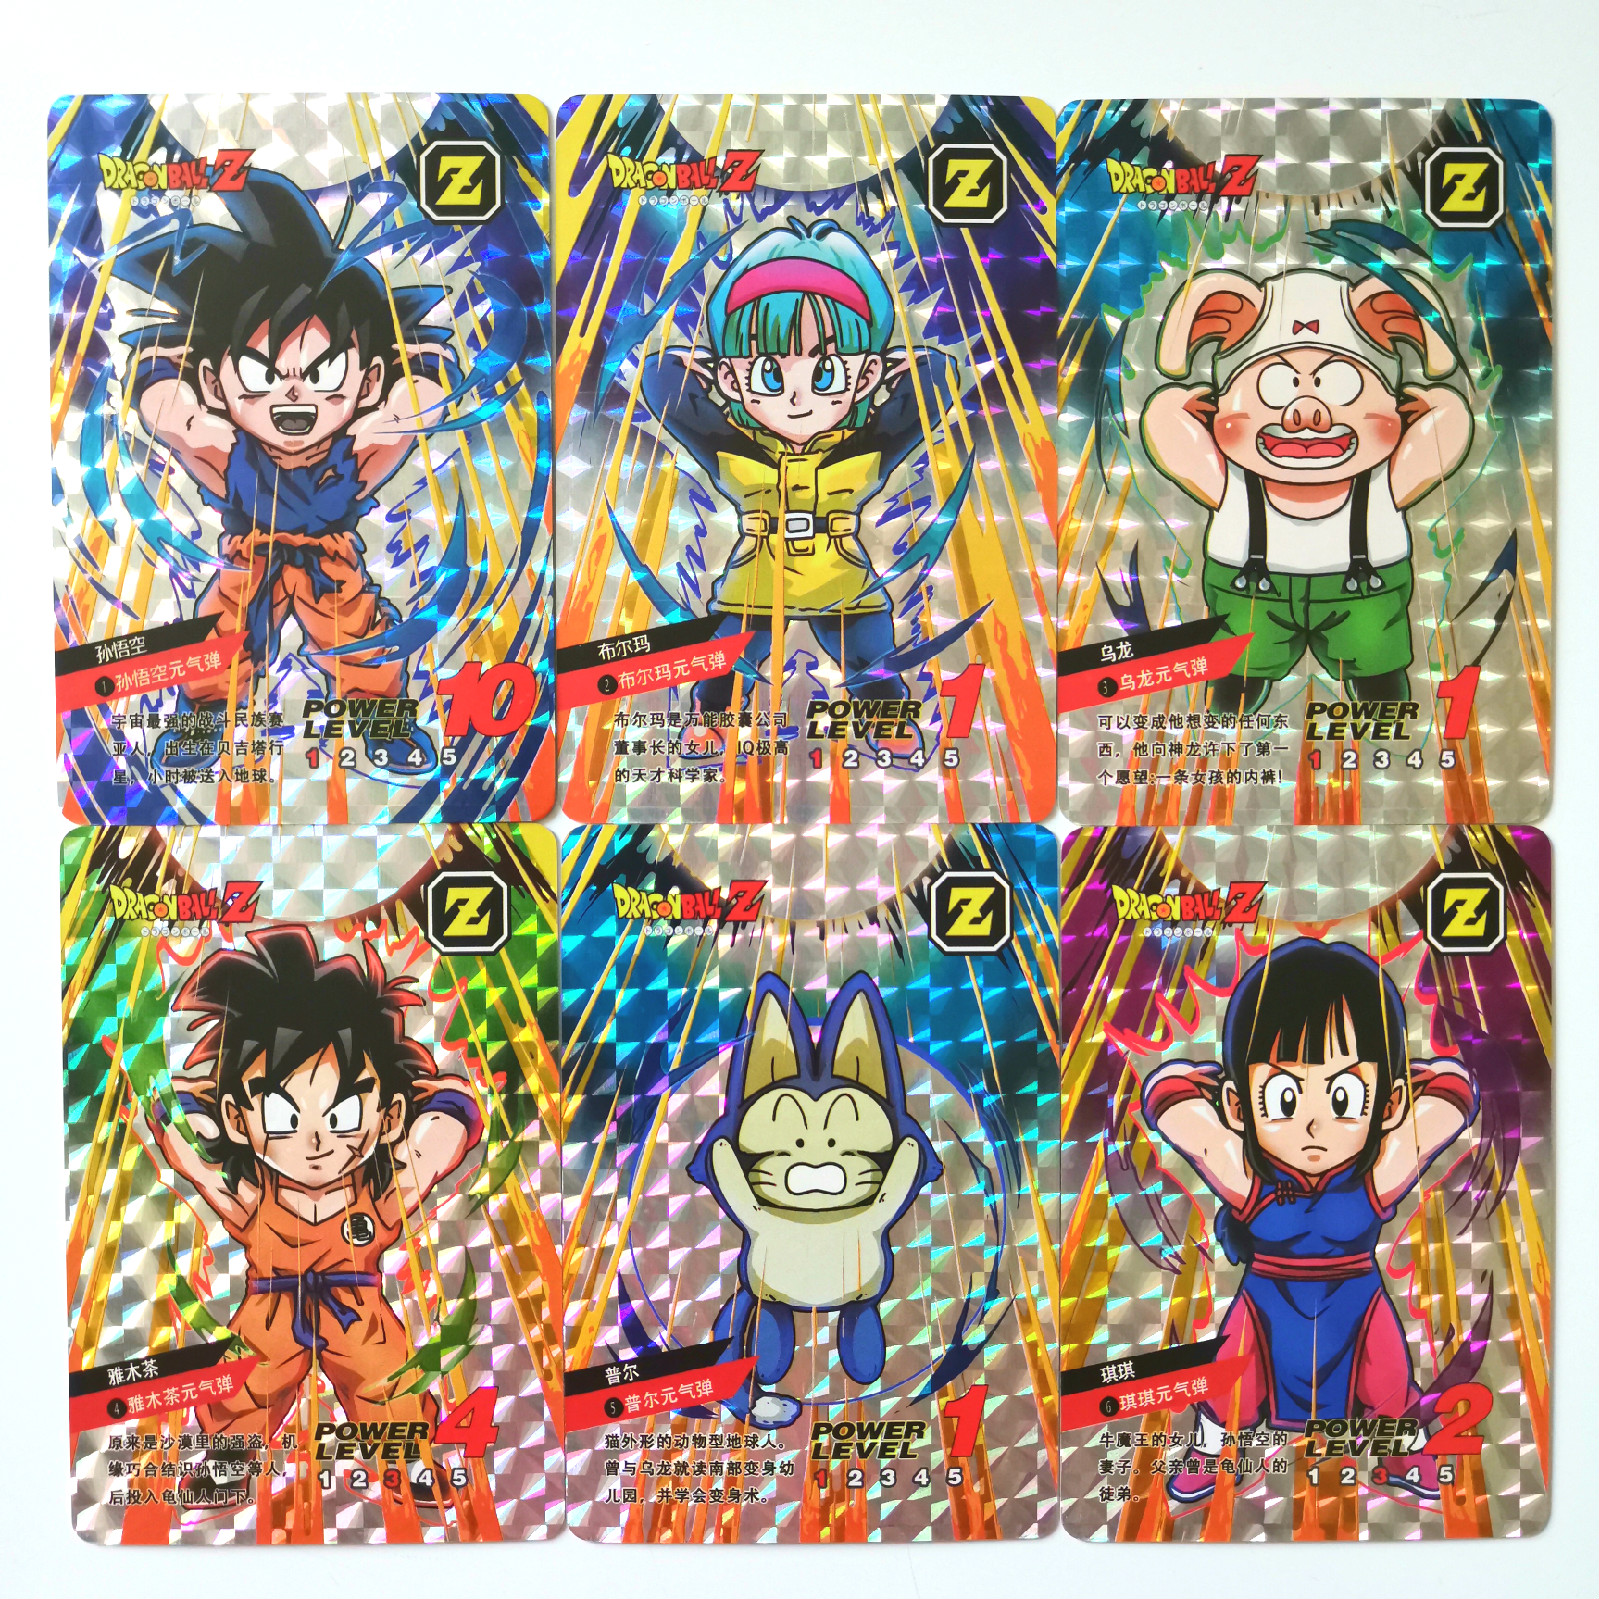 2019ins 55pcs/set Super Dragon Ball Z SEC/UR Heroes Battle Card Ultra Instinct Goku Vegeta Game Collection Cards